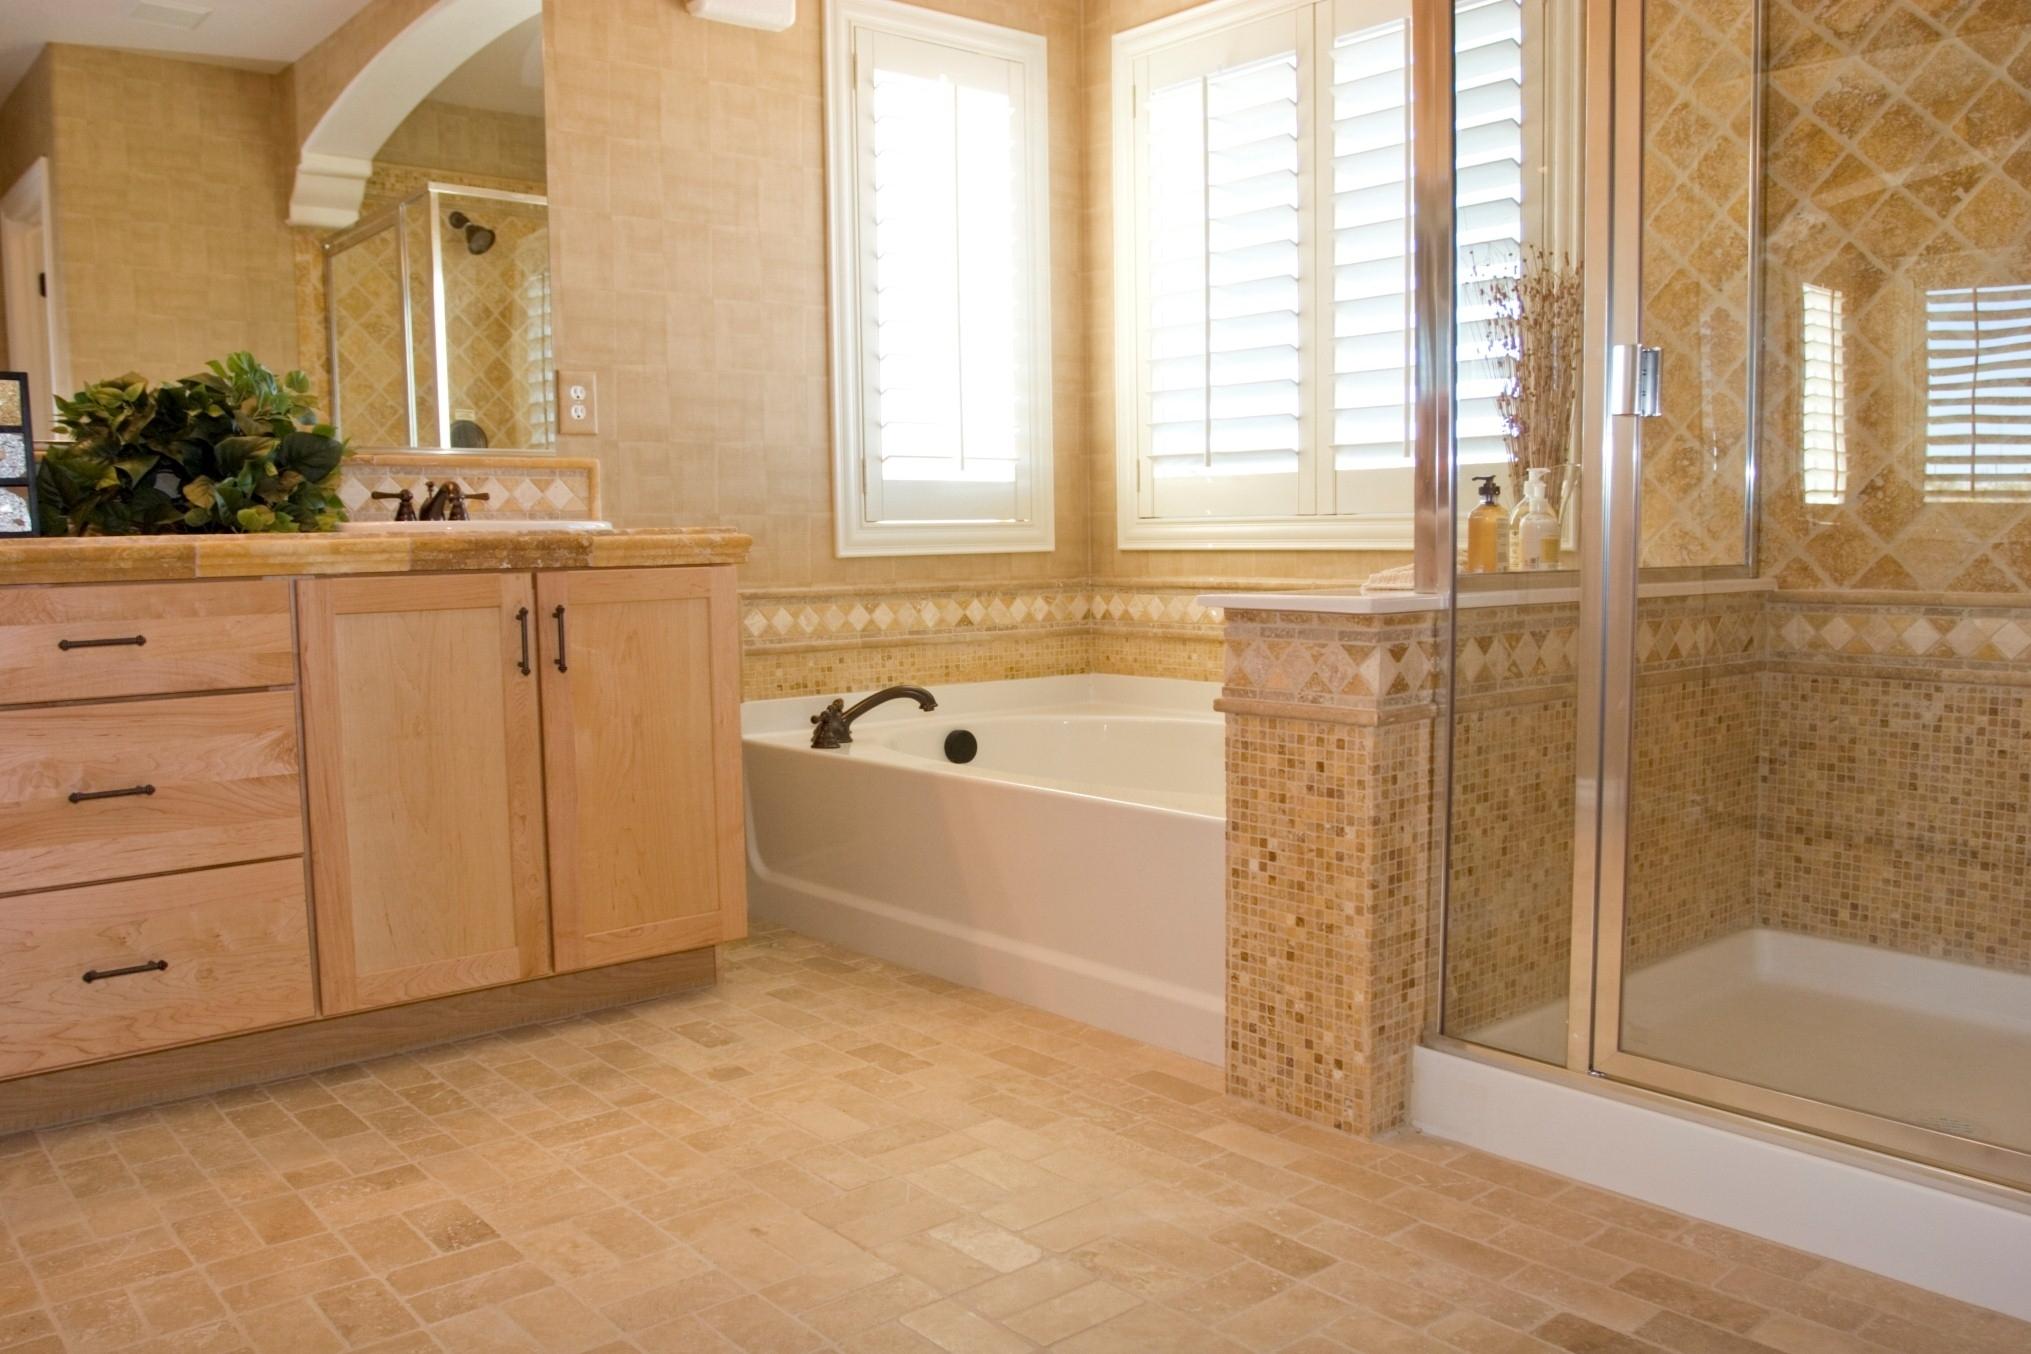 Modern Bathroom (Image 3 of 23)